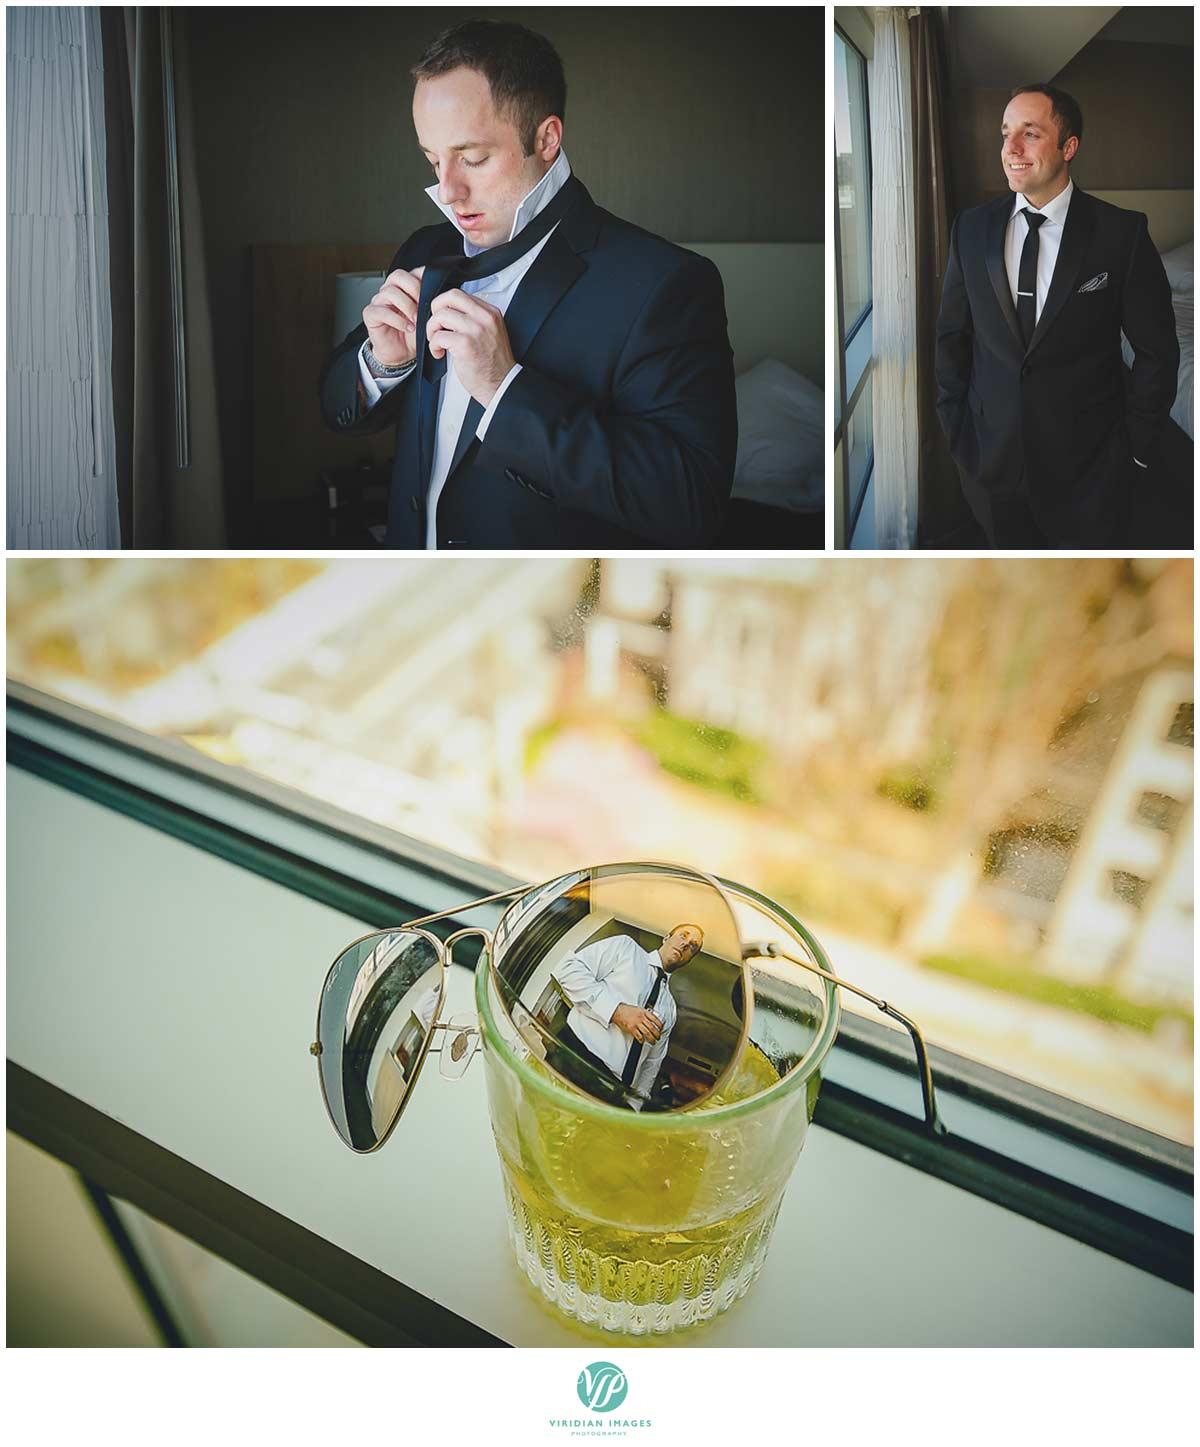 Peachtree_Club_Atlanta_Wedding_Viridian_Images_Photography-13